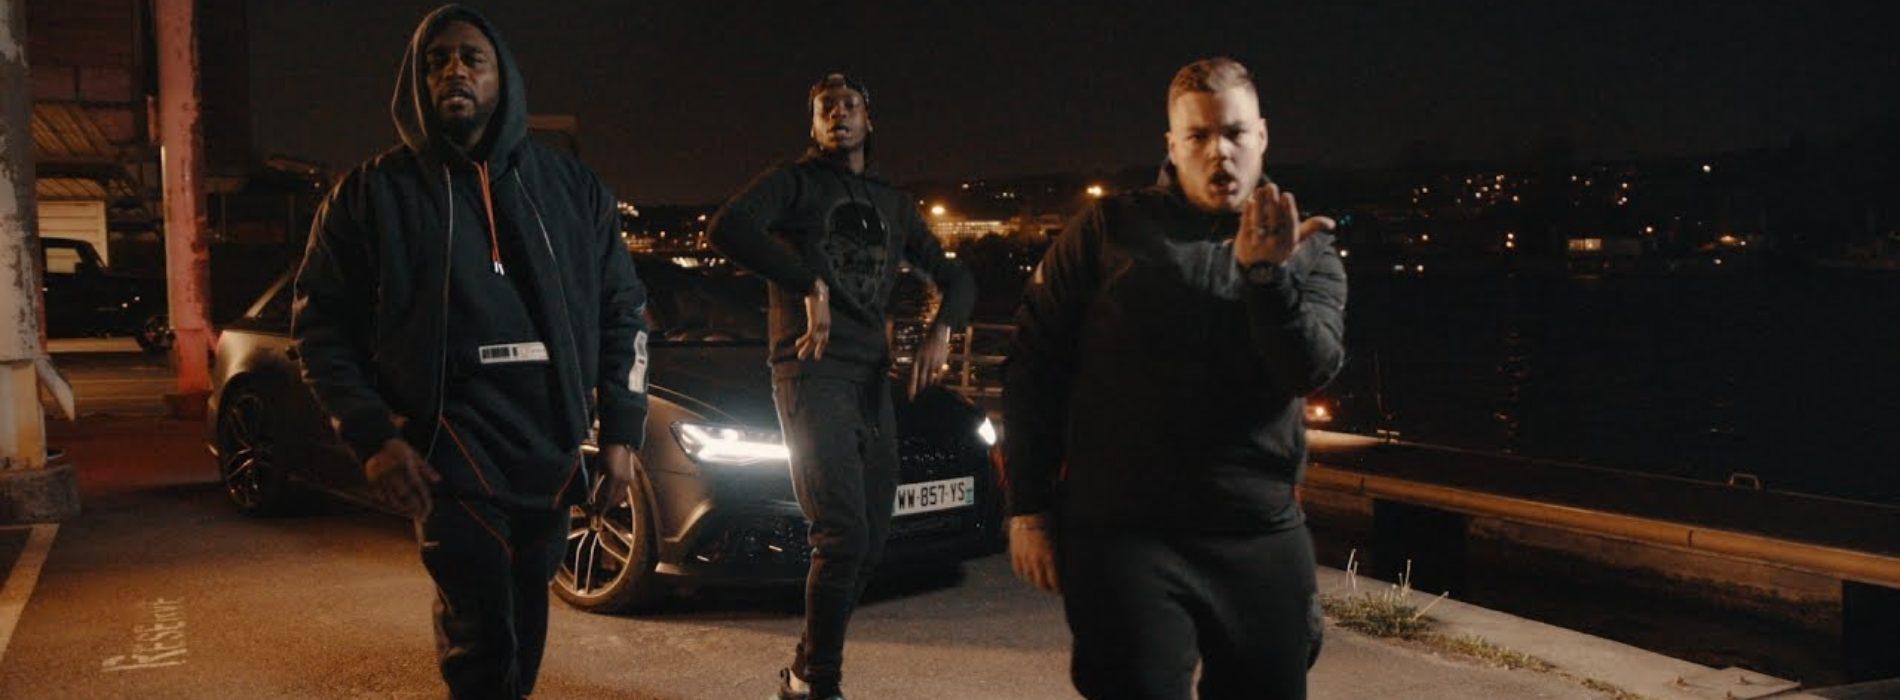 Rémy – Motel ft. Mac Tyer, Dinero – Mai 2019